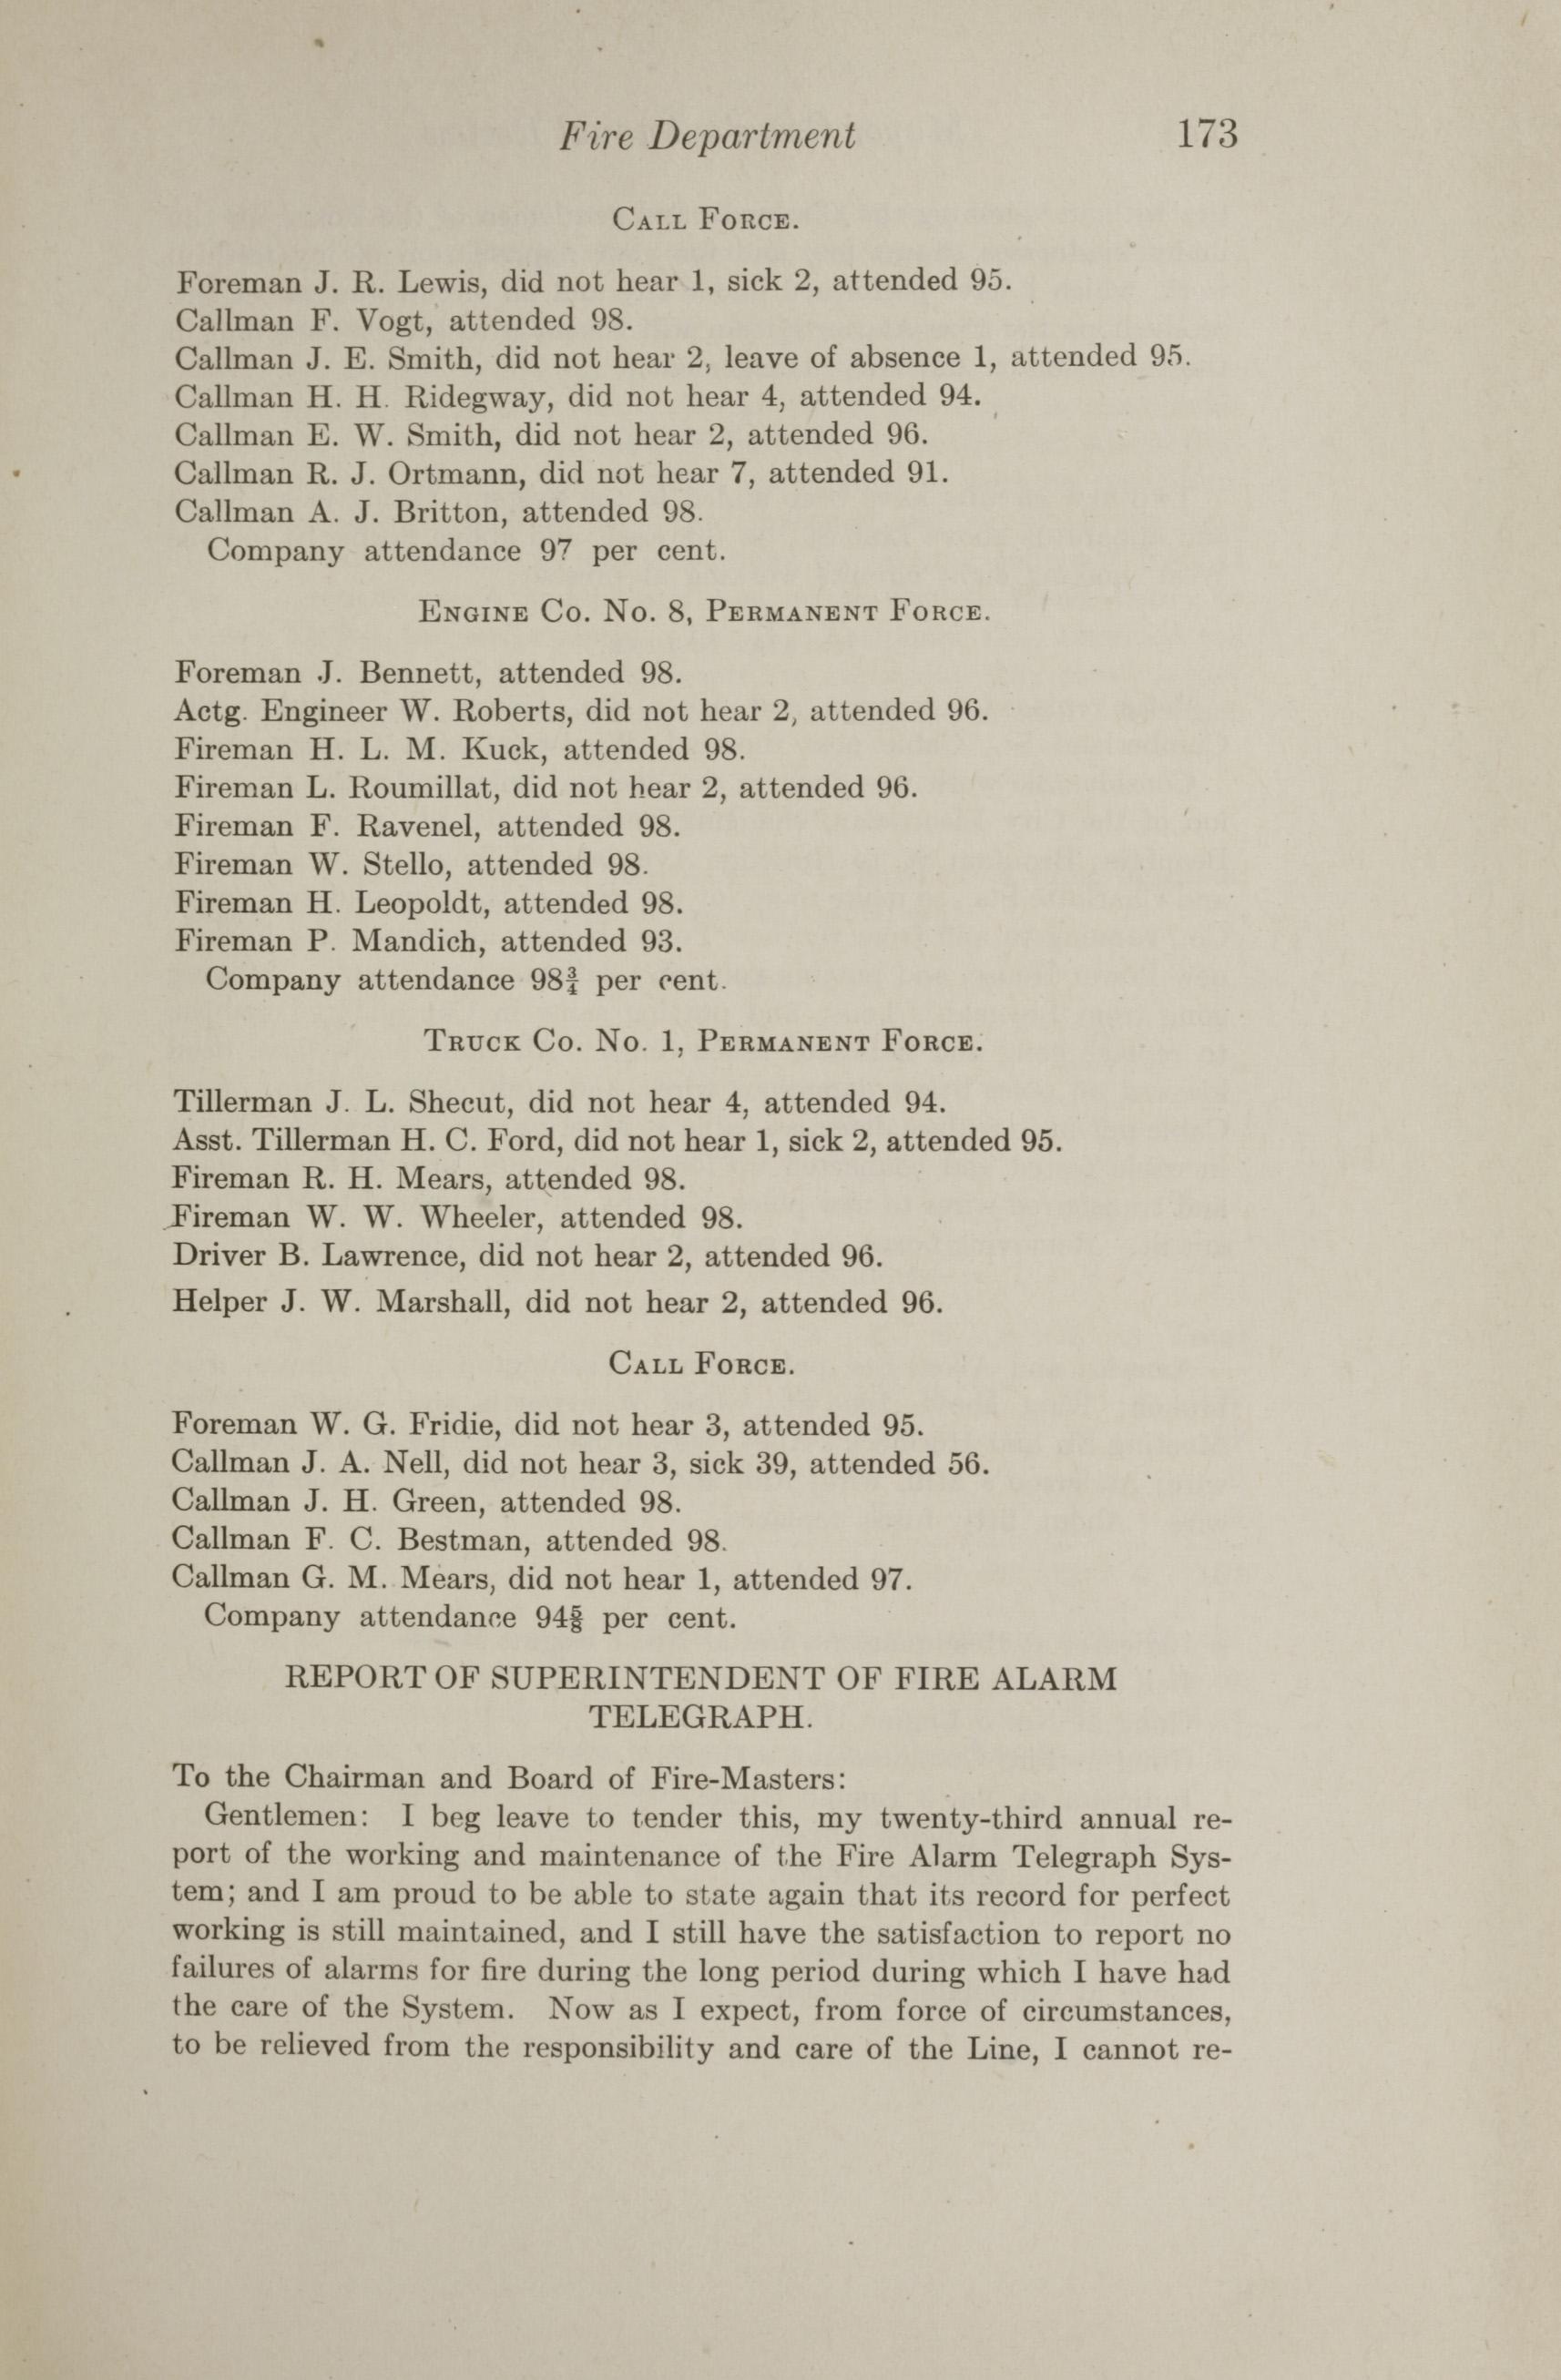 Charleston Yearbook, 1912, page 173